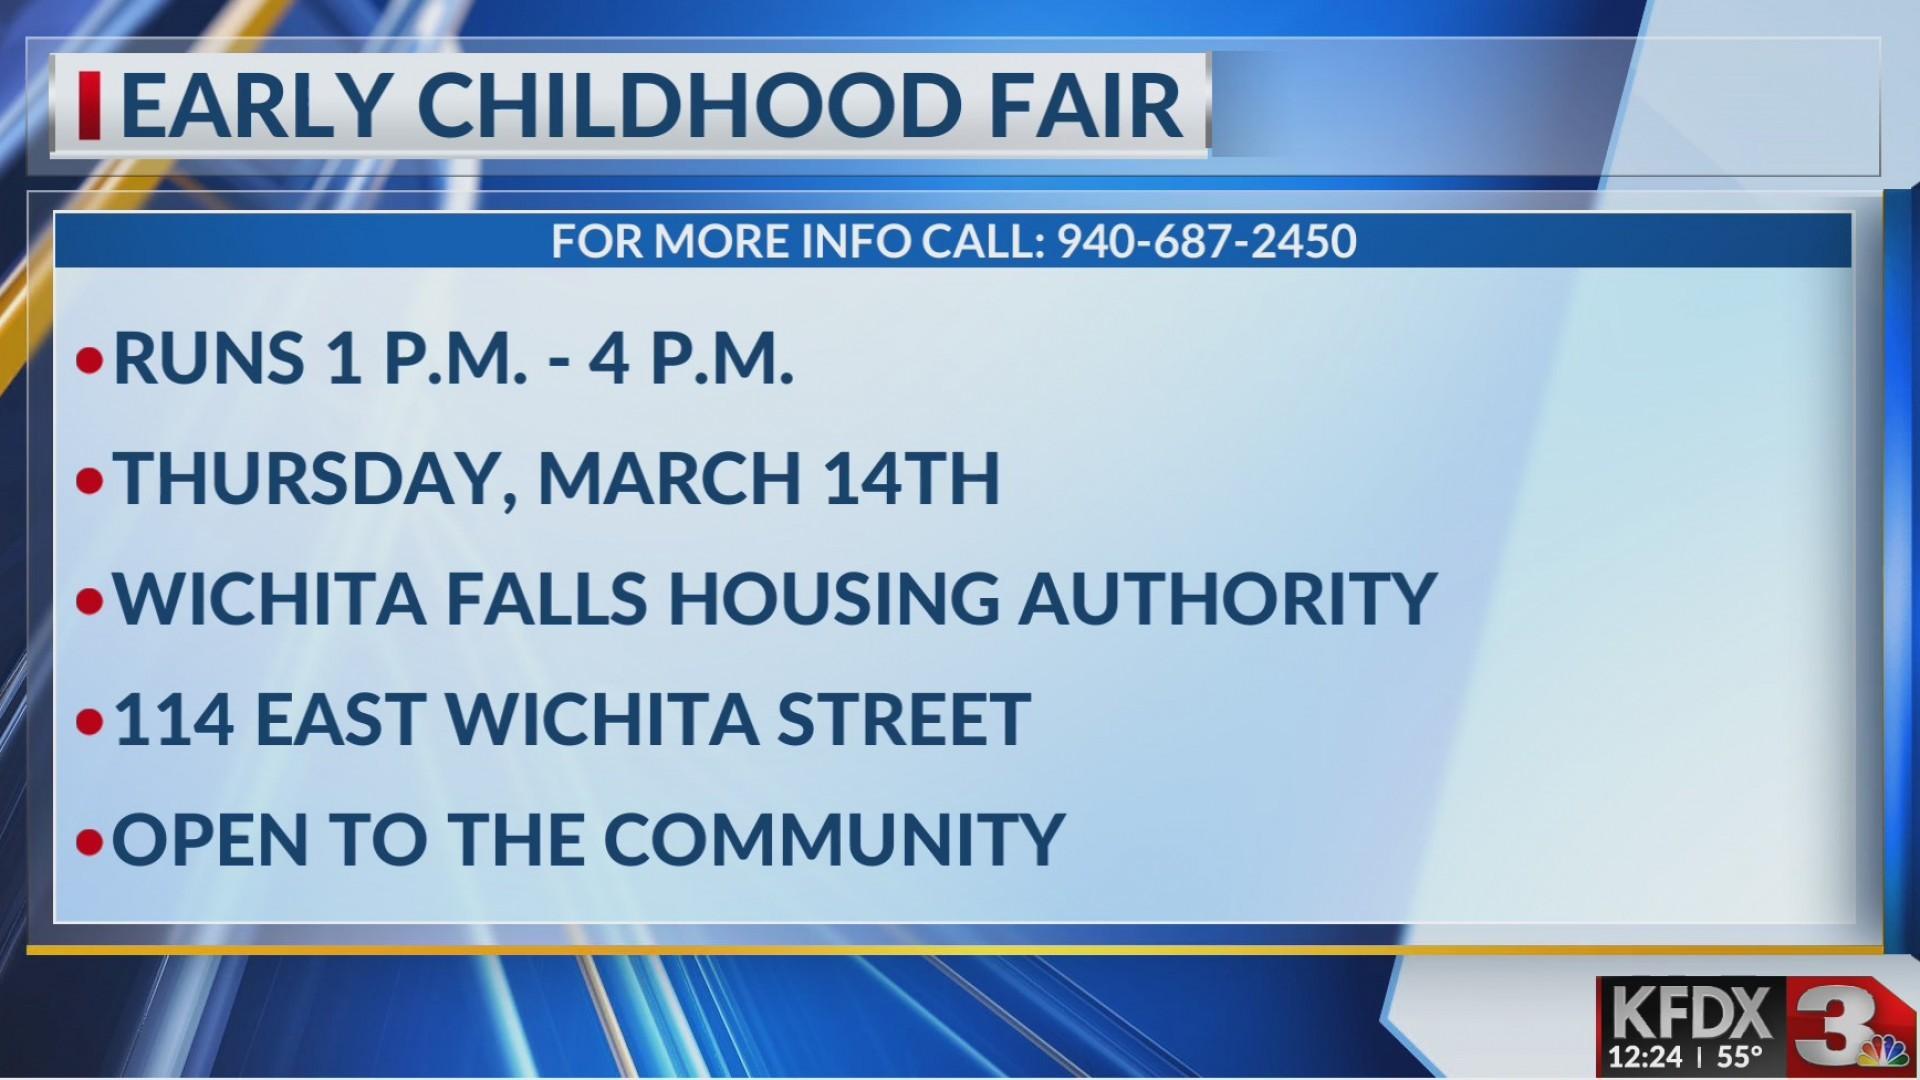 Wichita_Falls_Housing_Authority_5th_Annu_0_20190307183151